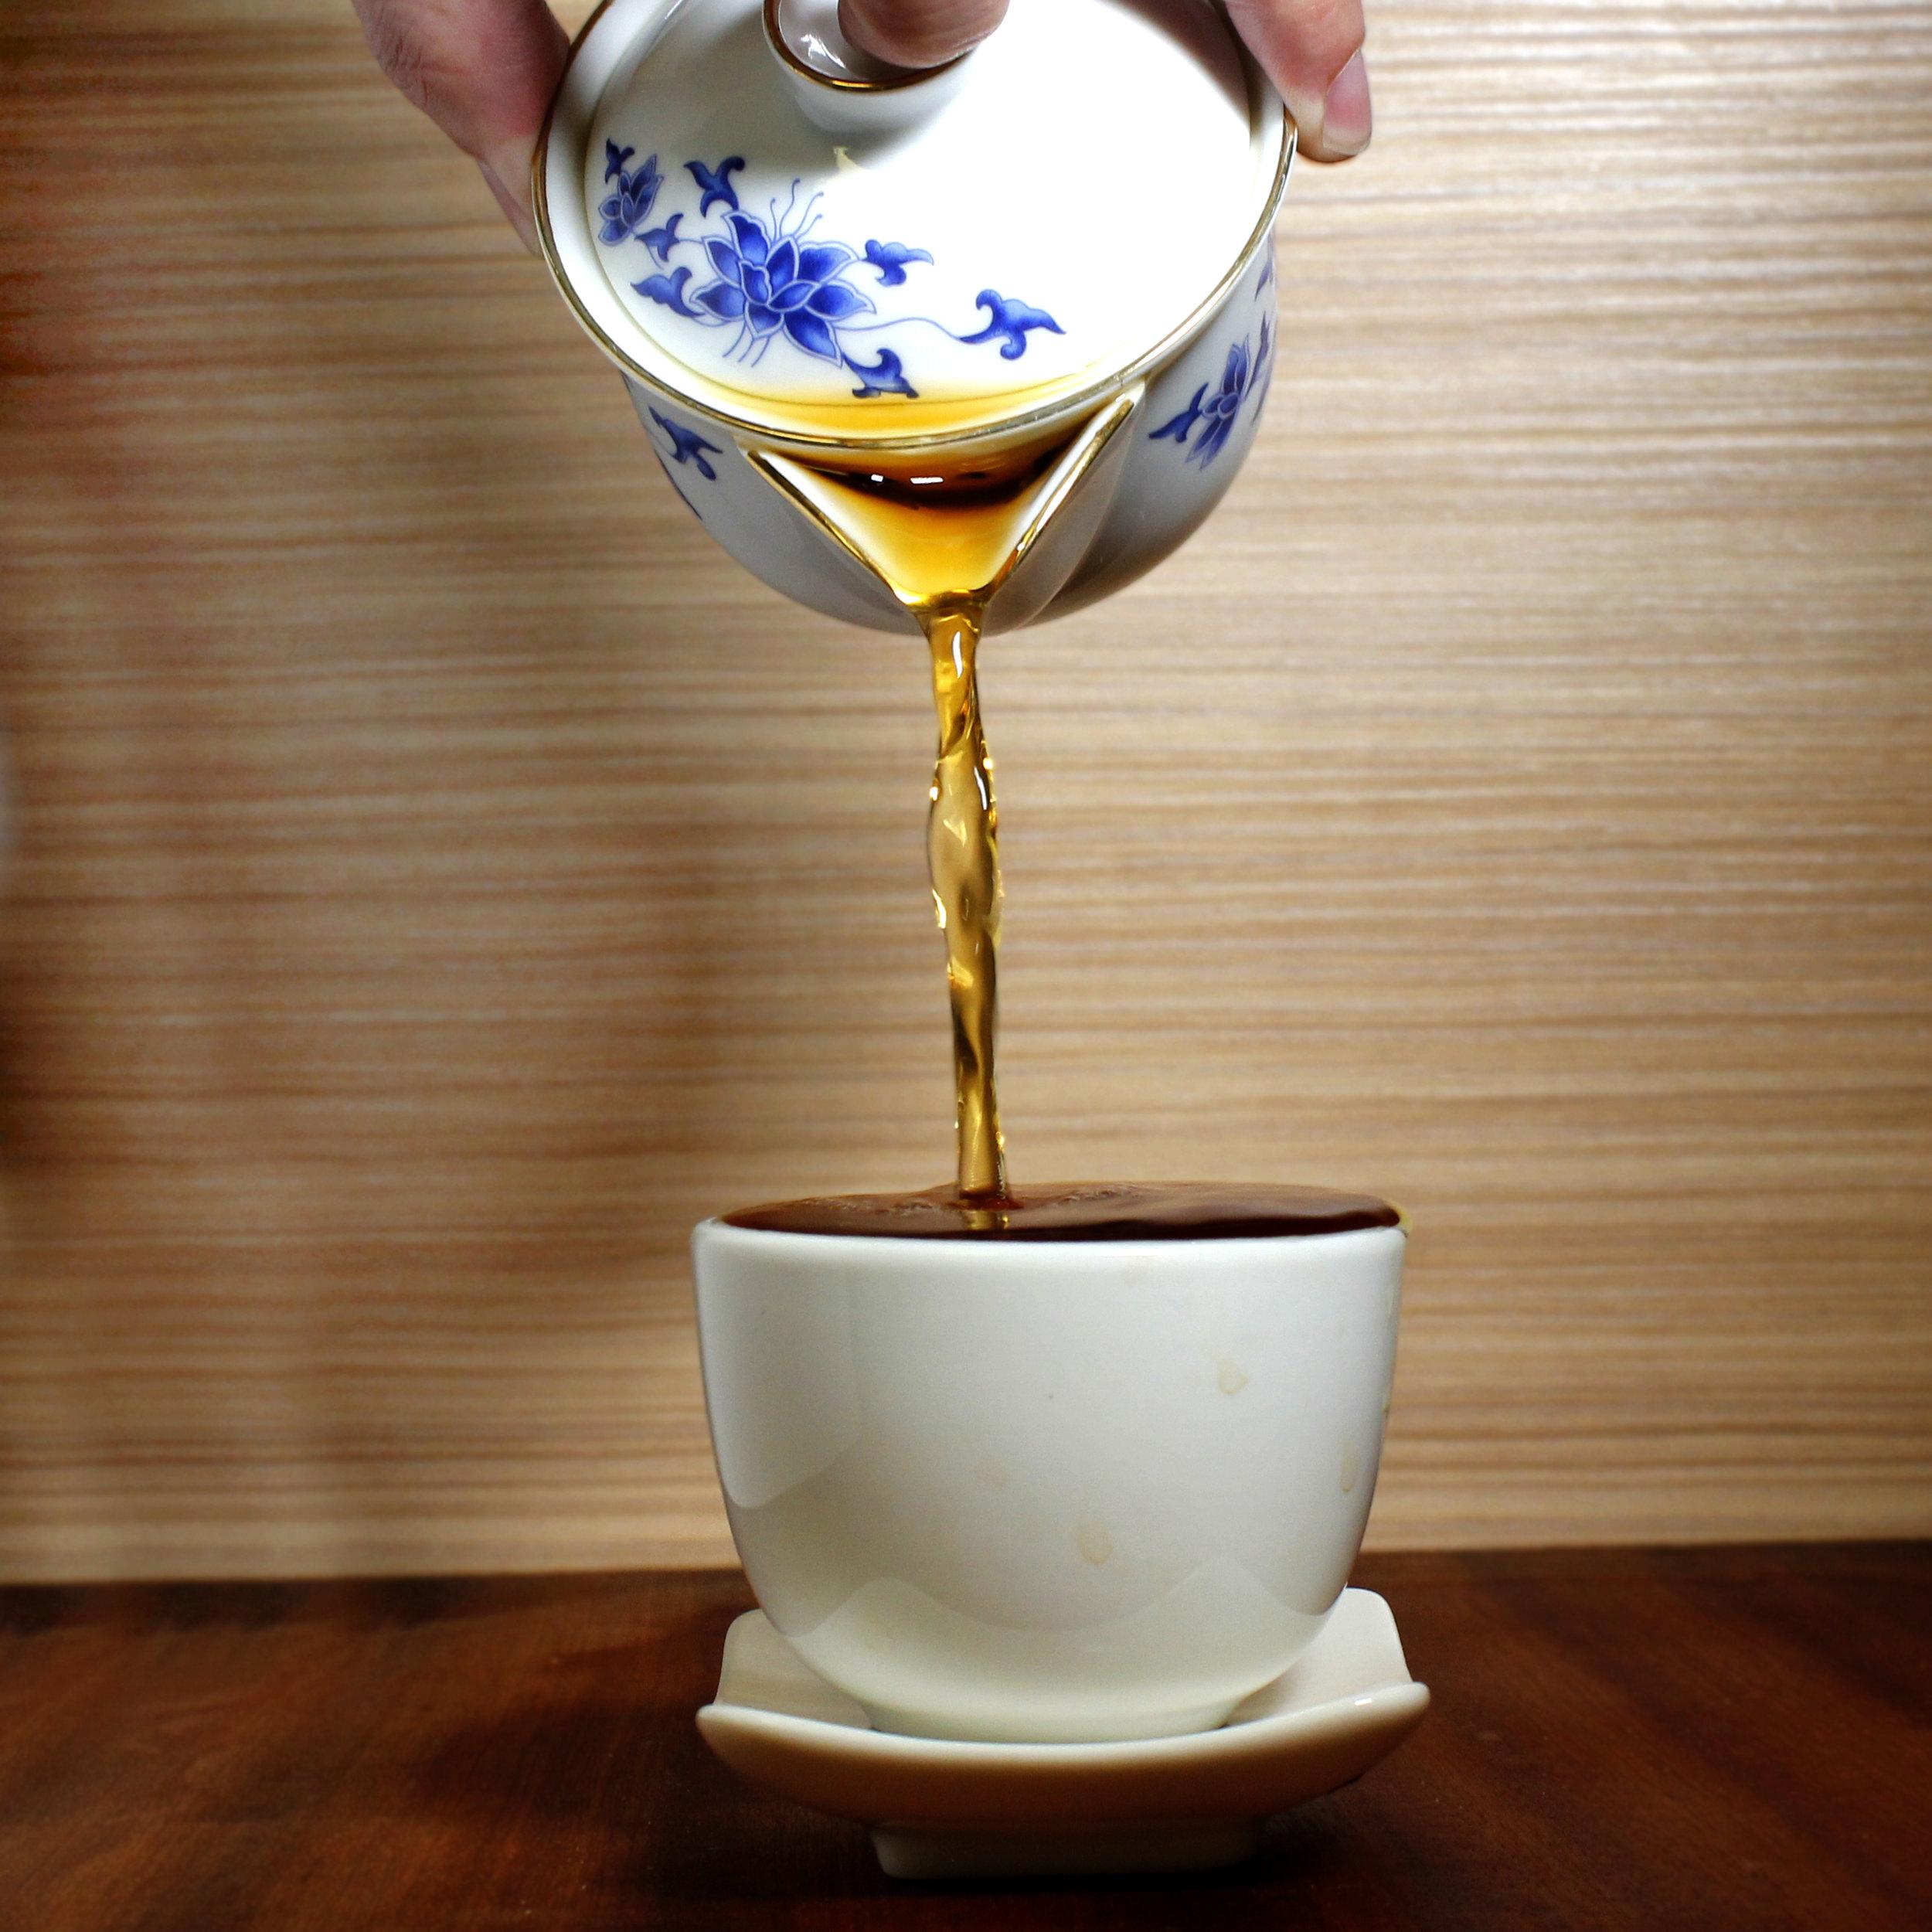 yunnan-dian-hong-china-black-whole-leaf-loose-mem-tea-itw1-2019b.jpg